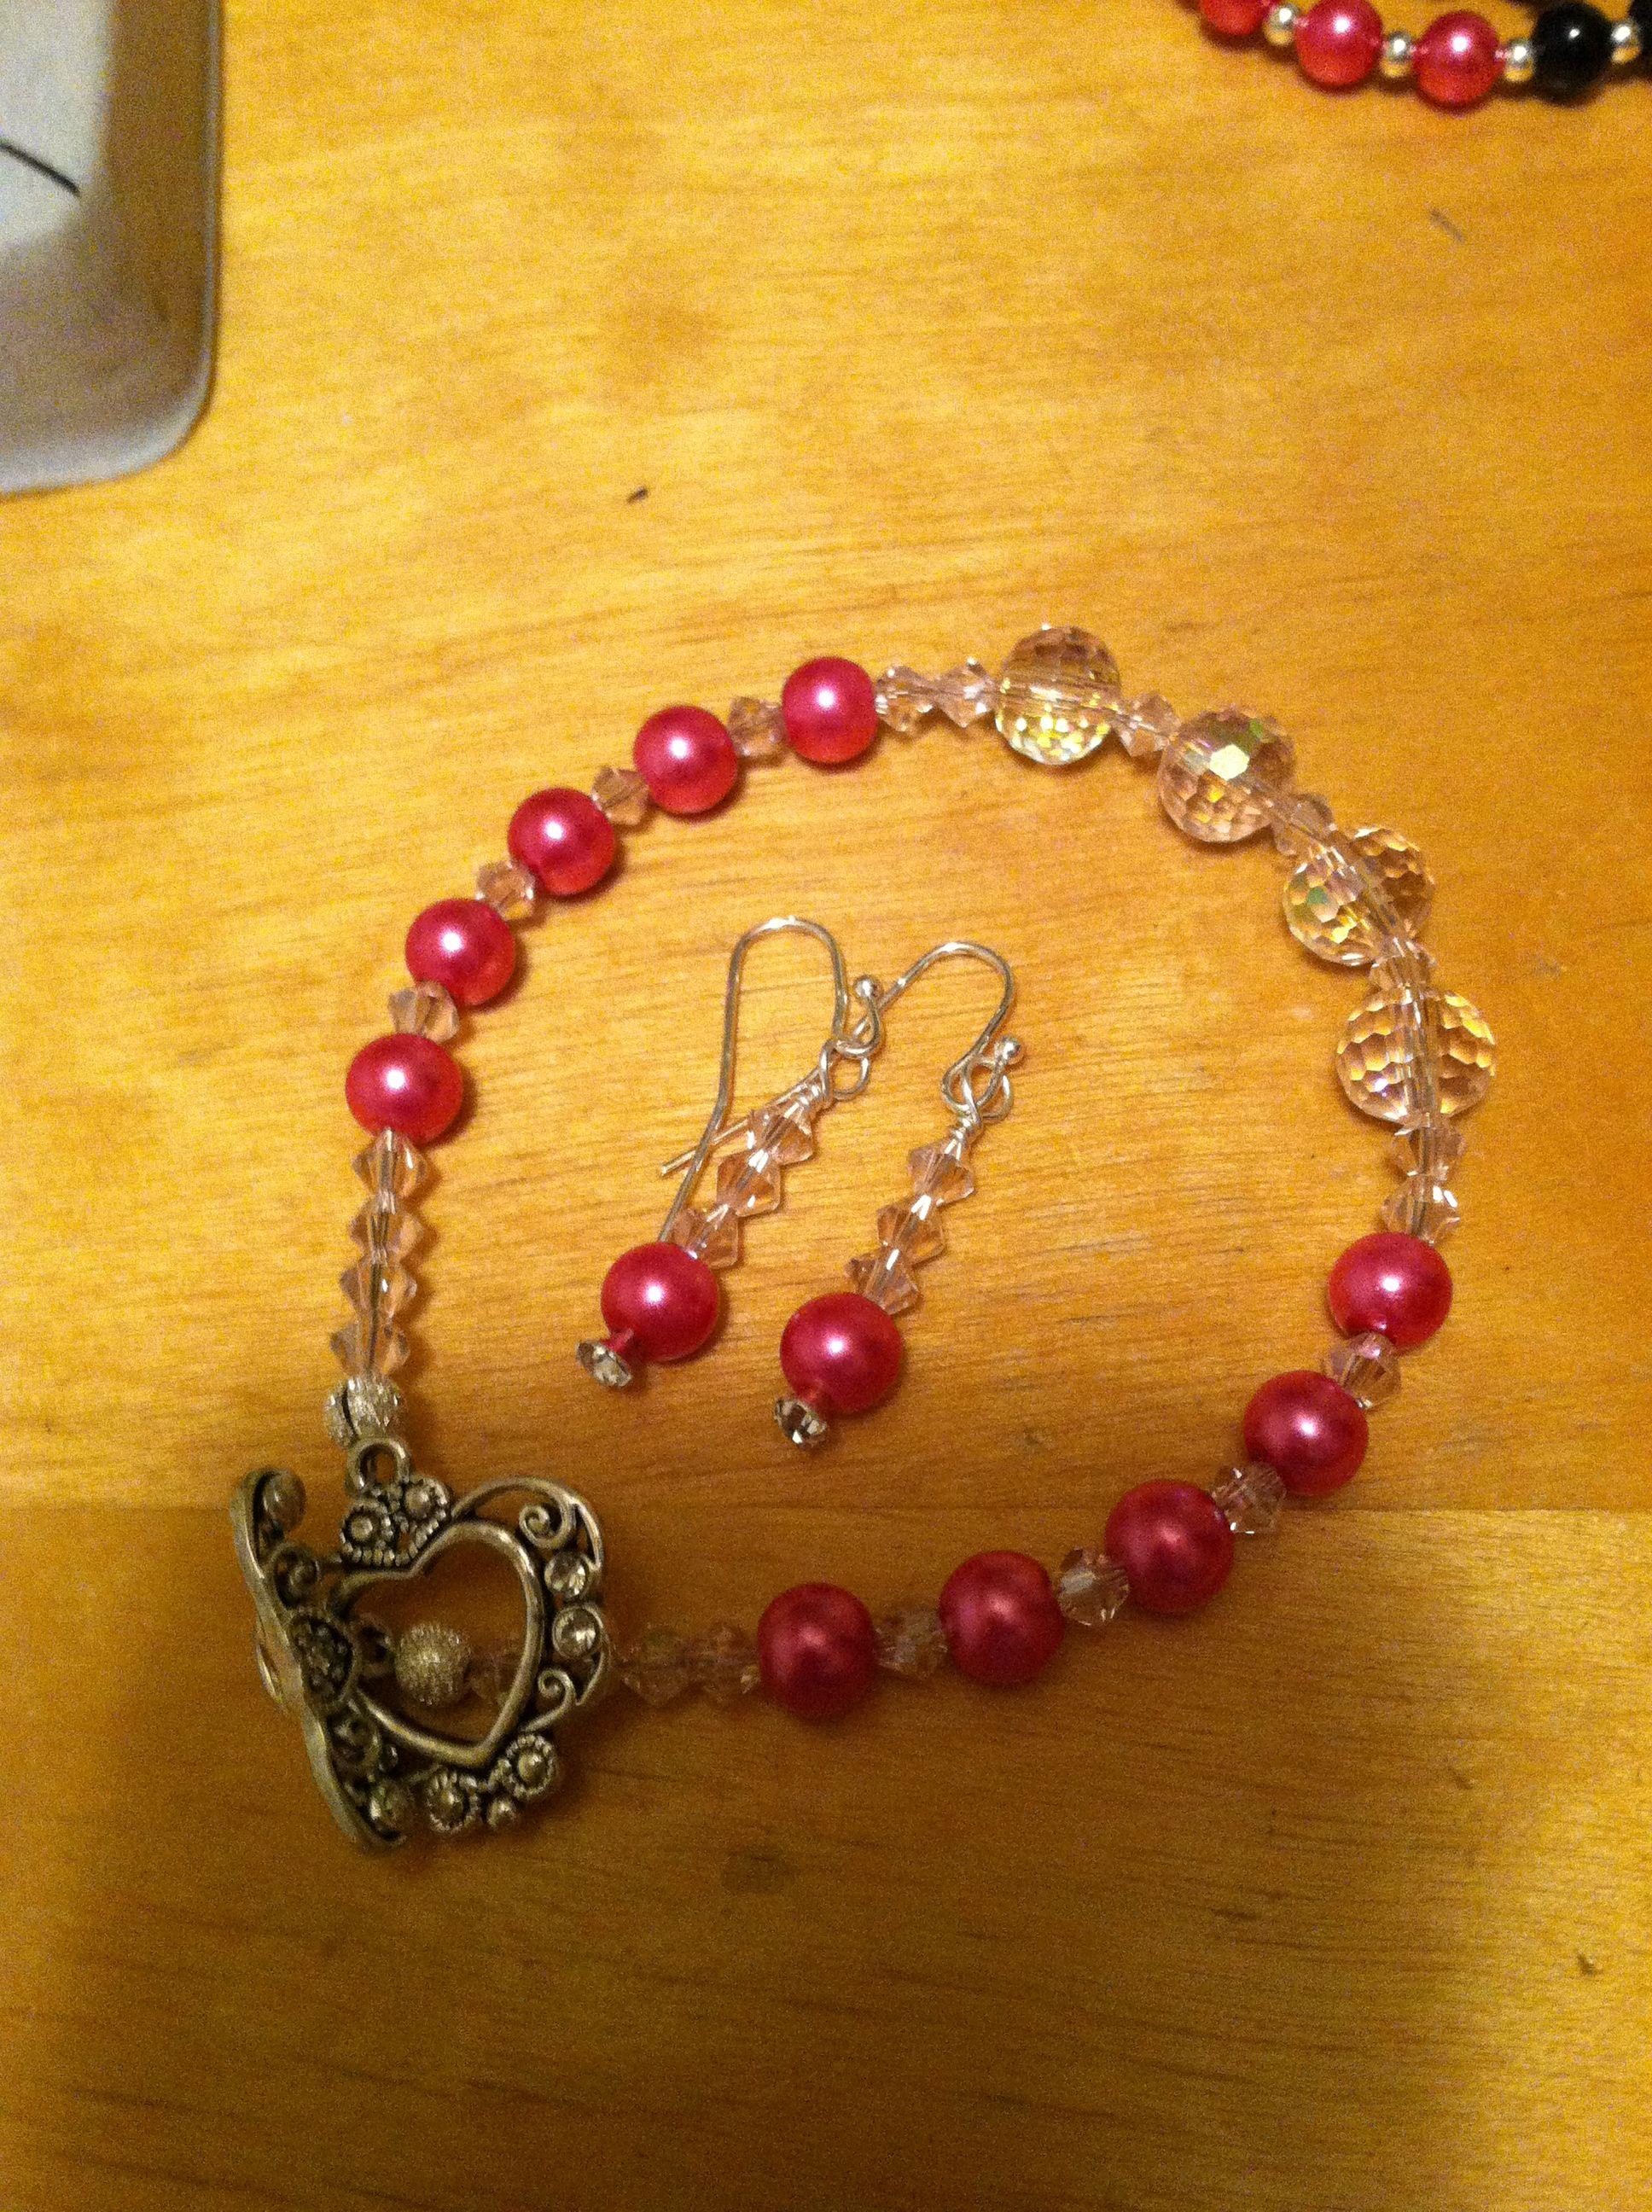 Pink bracelet and earrings